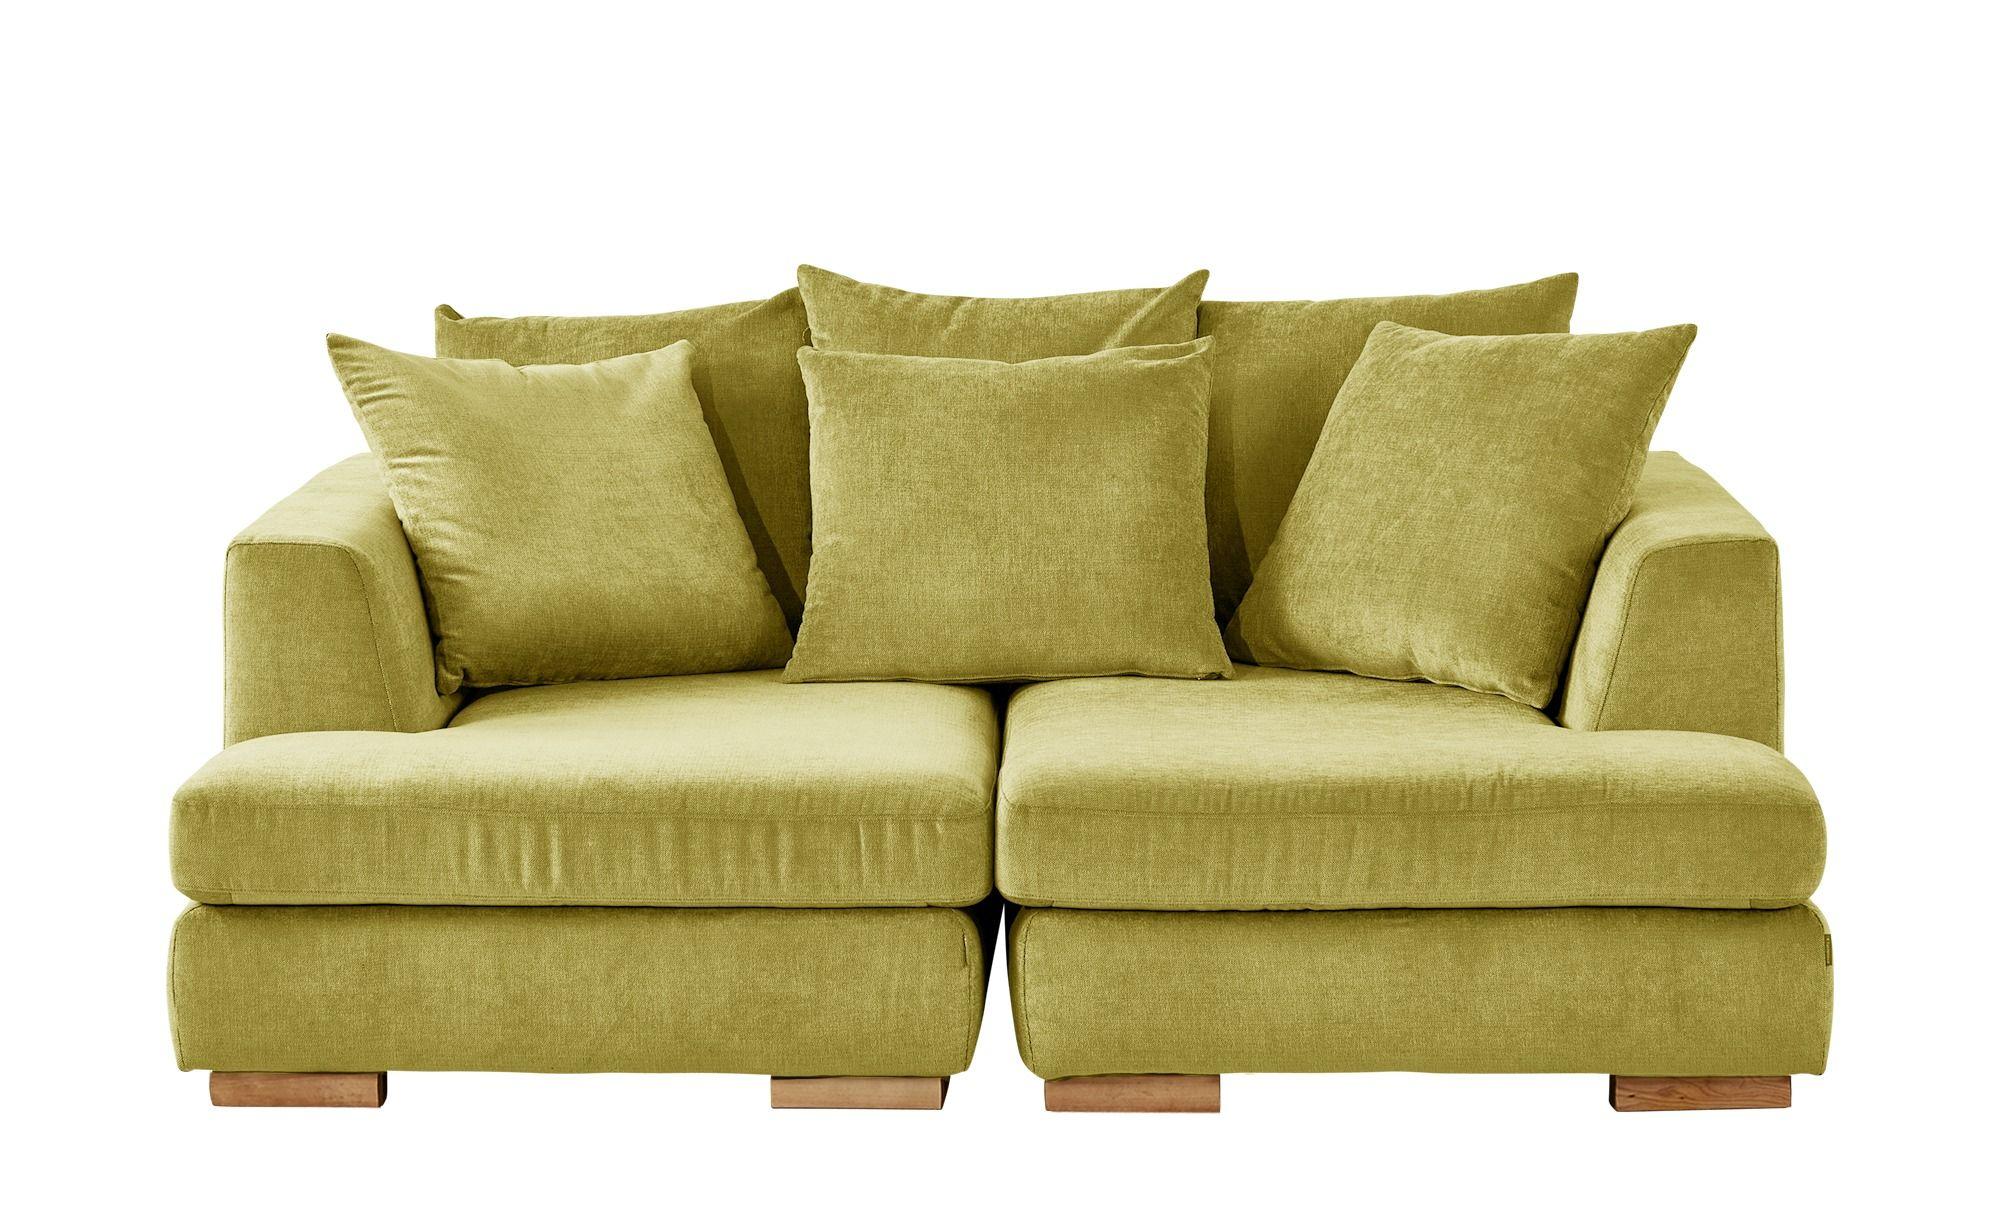 Soho Loveseat Gelb Webstoff Paso Doble Kleines Sofa Sofa Design Ecksofa Schlaffunktion